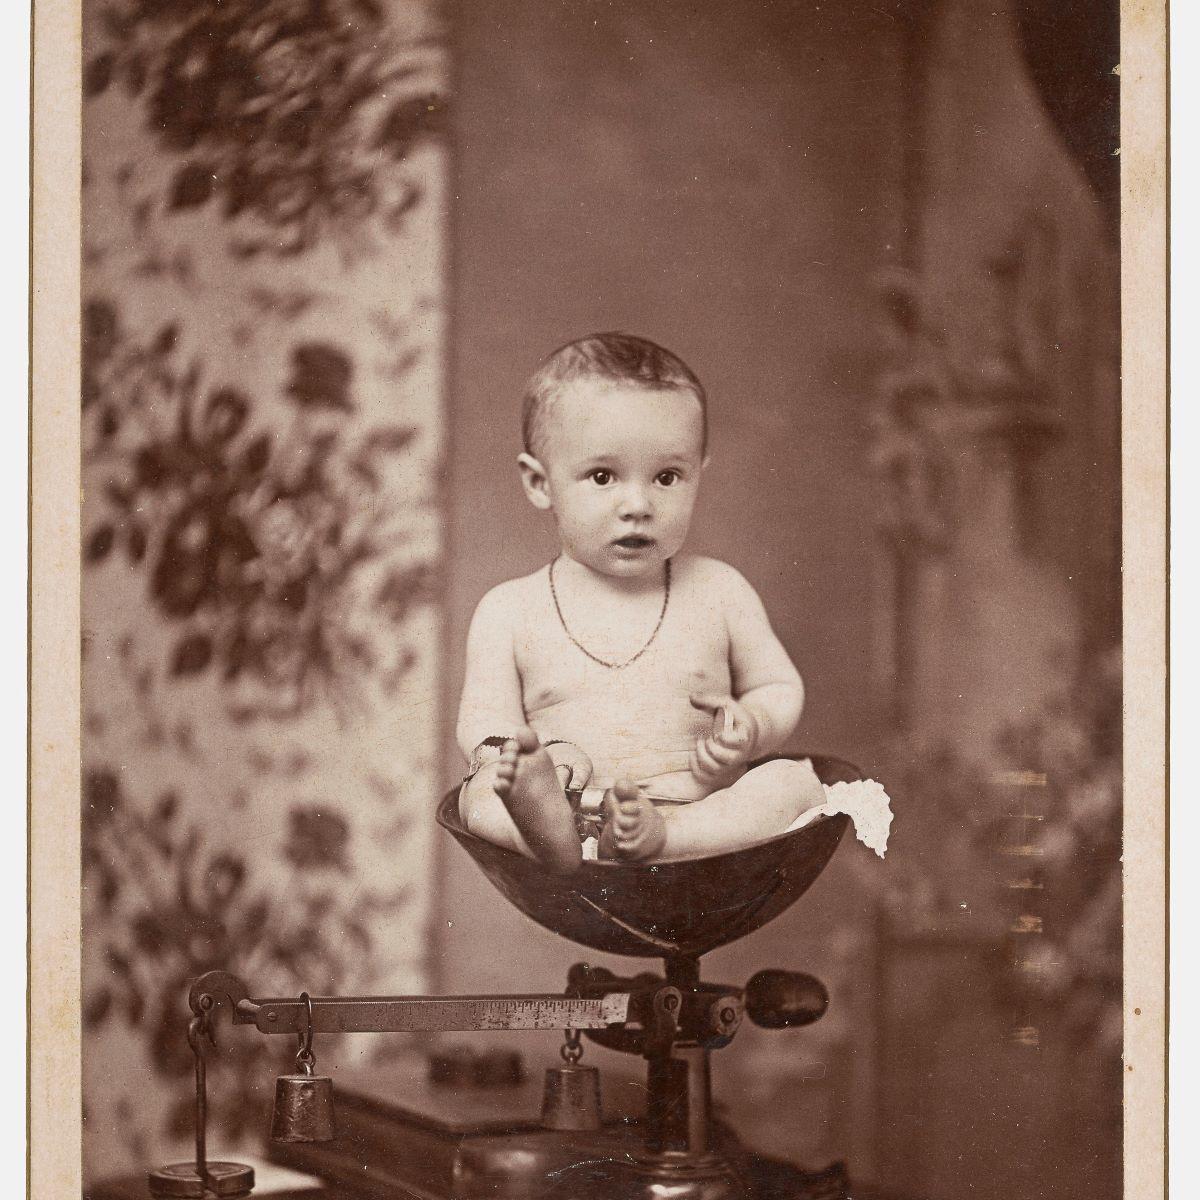 W. A. Wilcoxon, Bonaparte, IA, [Baby], 1890s,